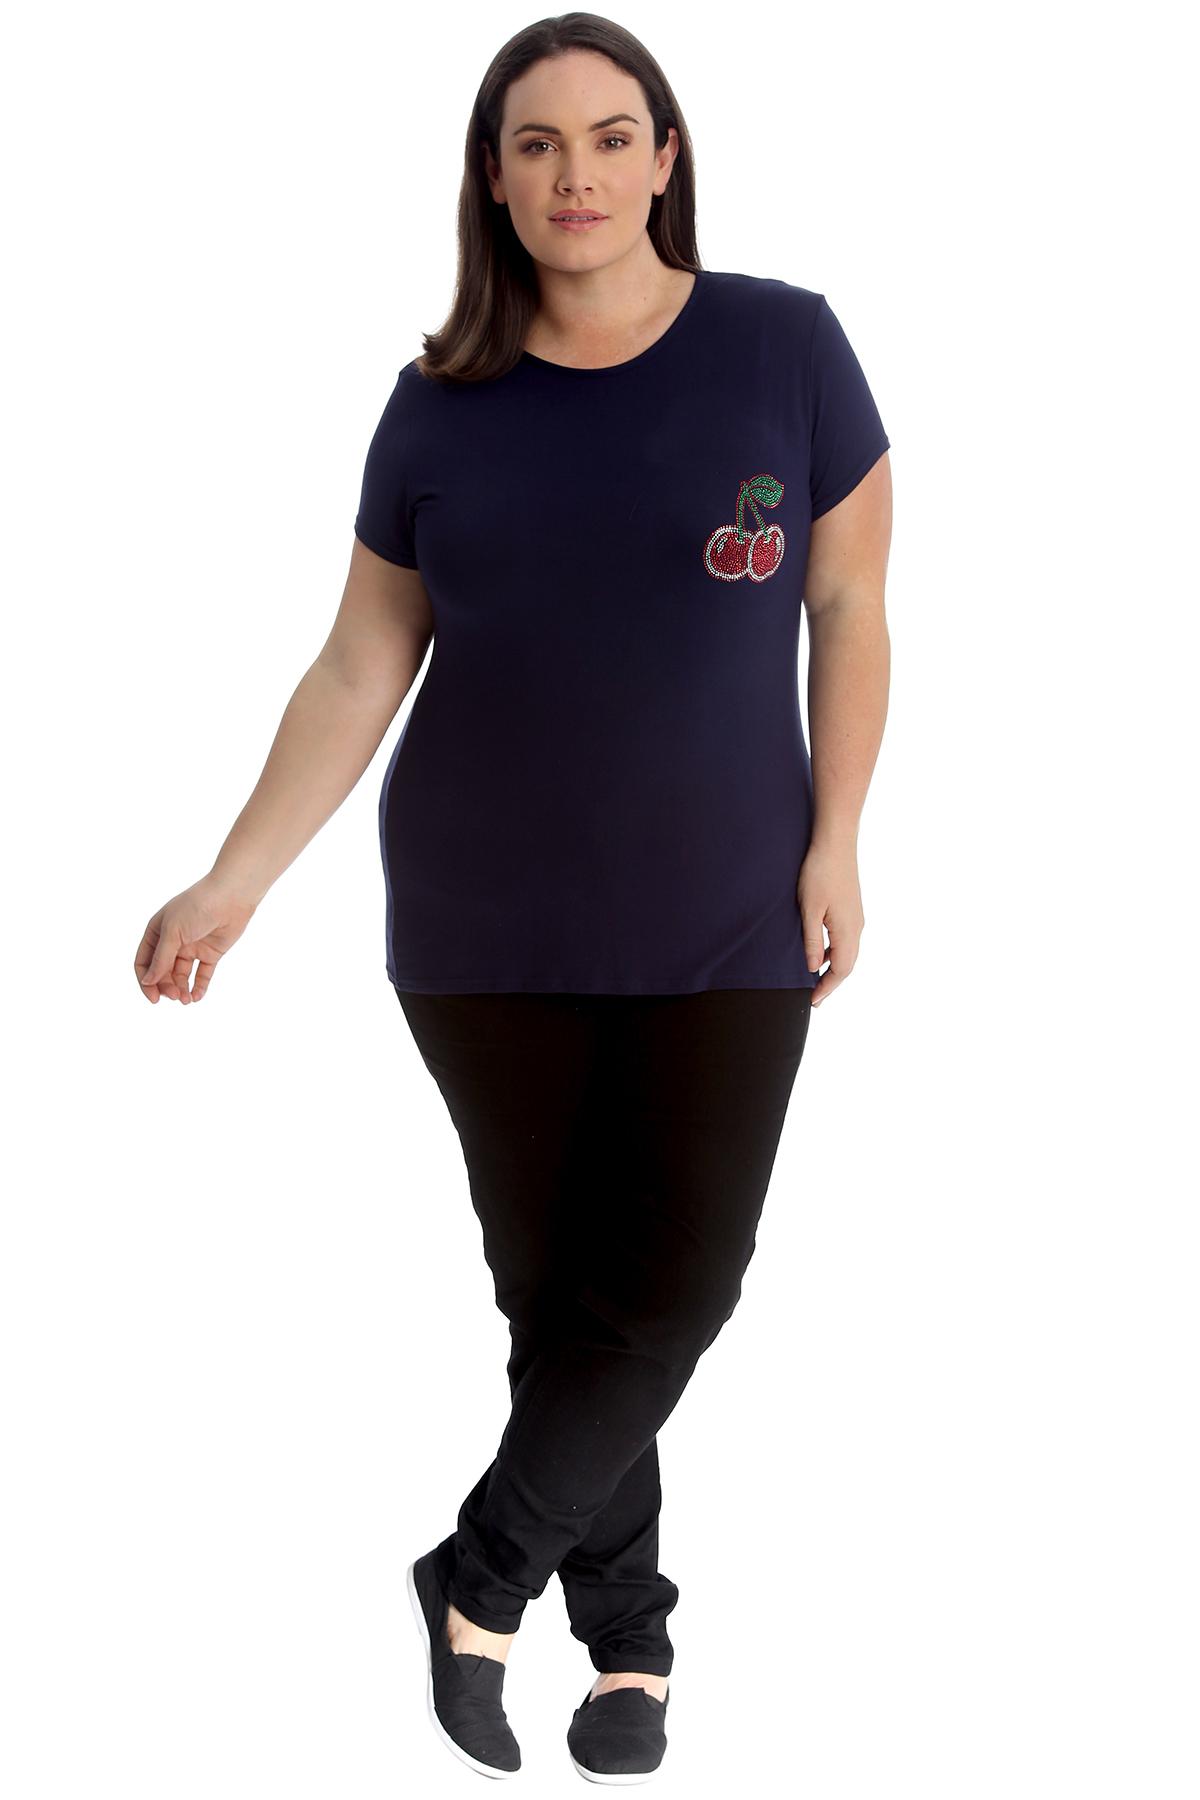 New-Womens-Plus-Size-Top-Ladies-Cherry-Rhinestone-T-Shirt-Soft-Stud-Shiny-Hip thumbnail 32